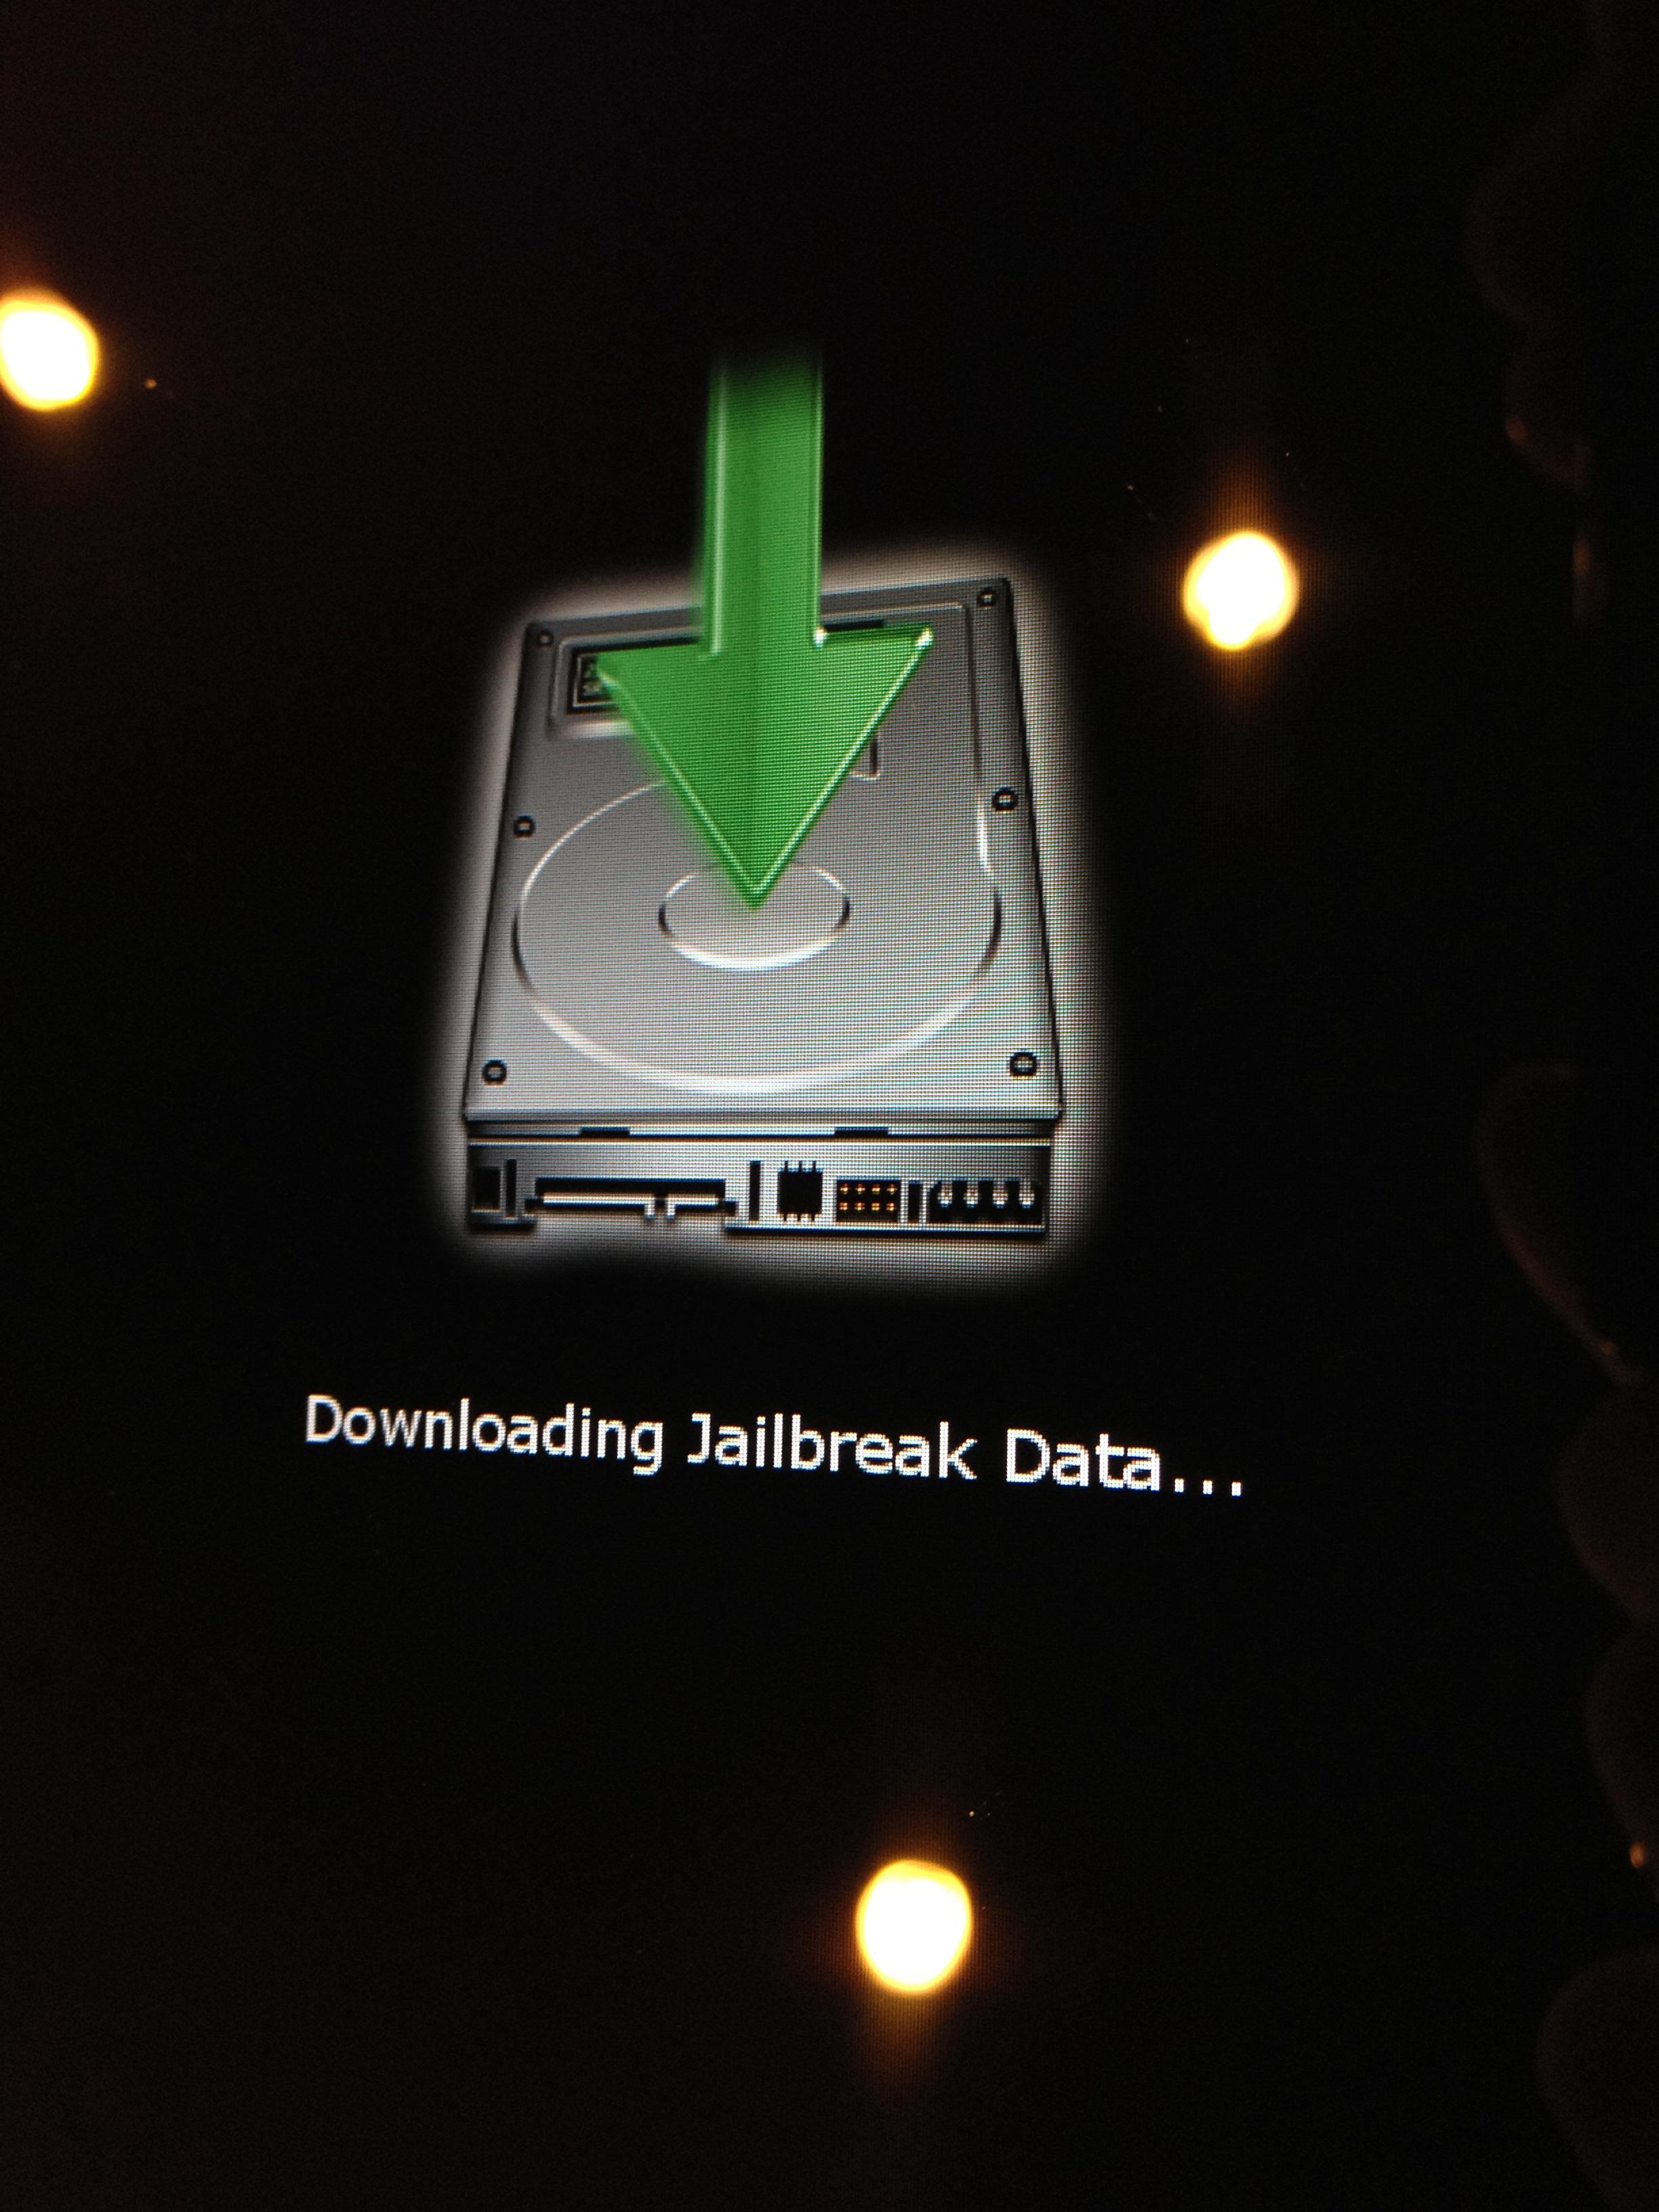 Jailbreak iPad 1 on iOS 5 0 1 with redsn0w